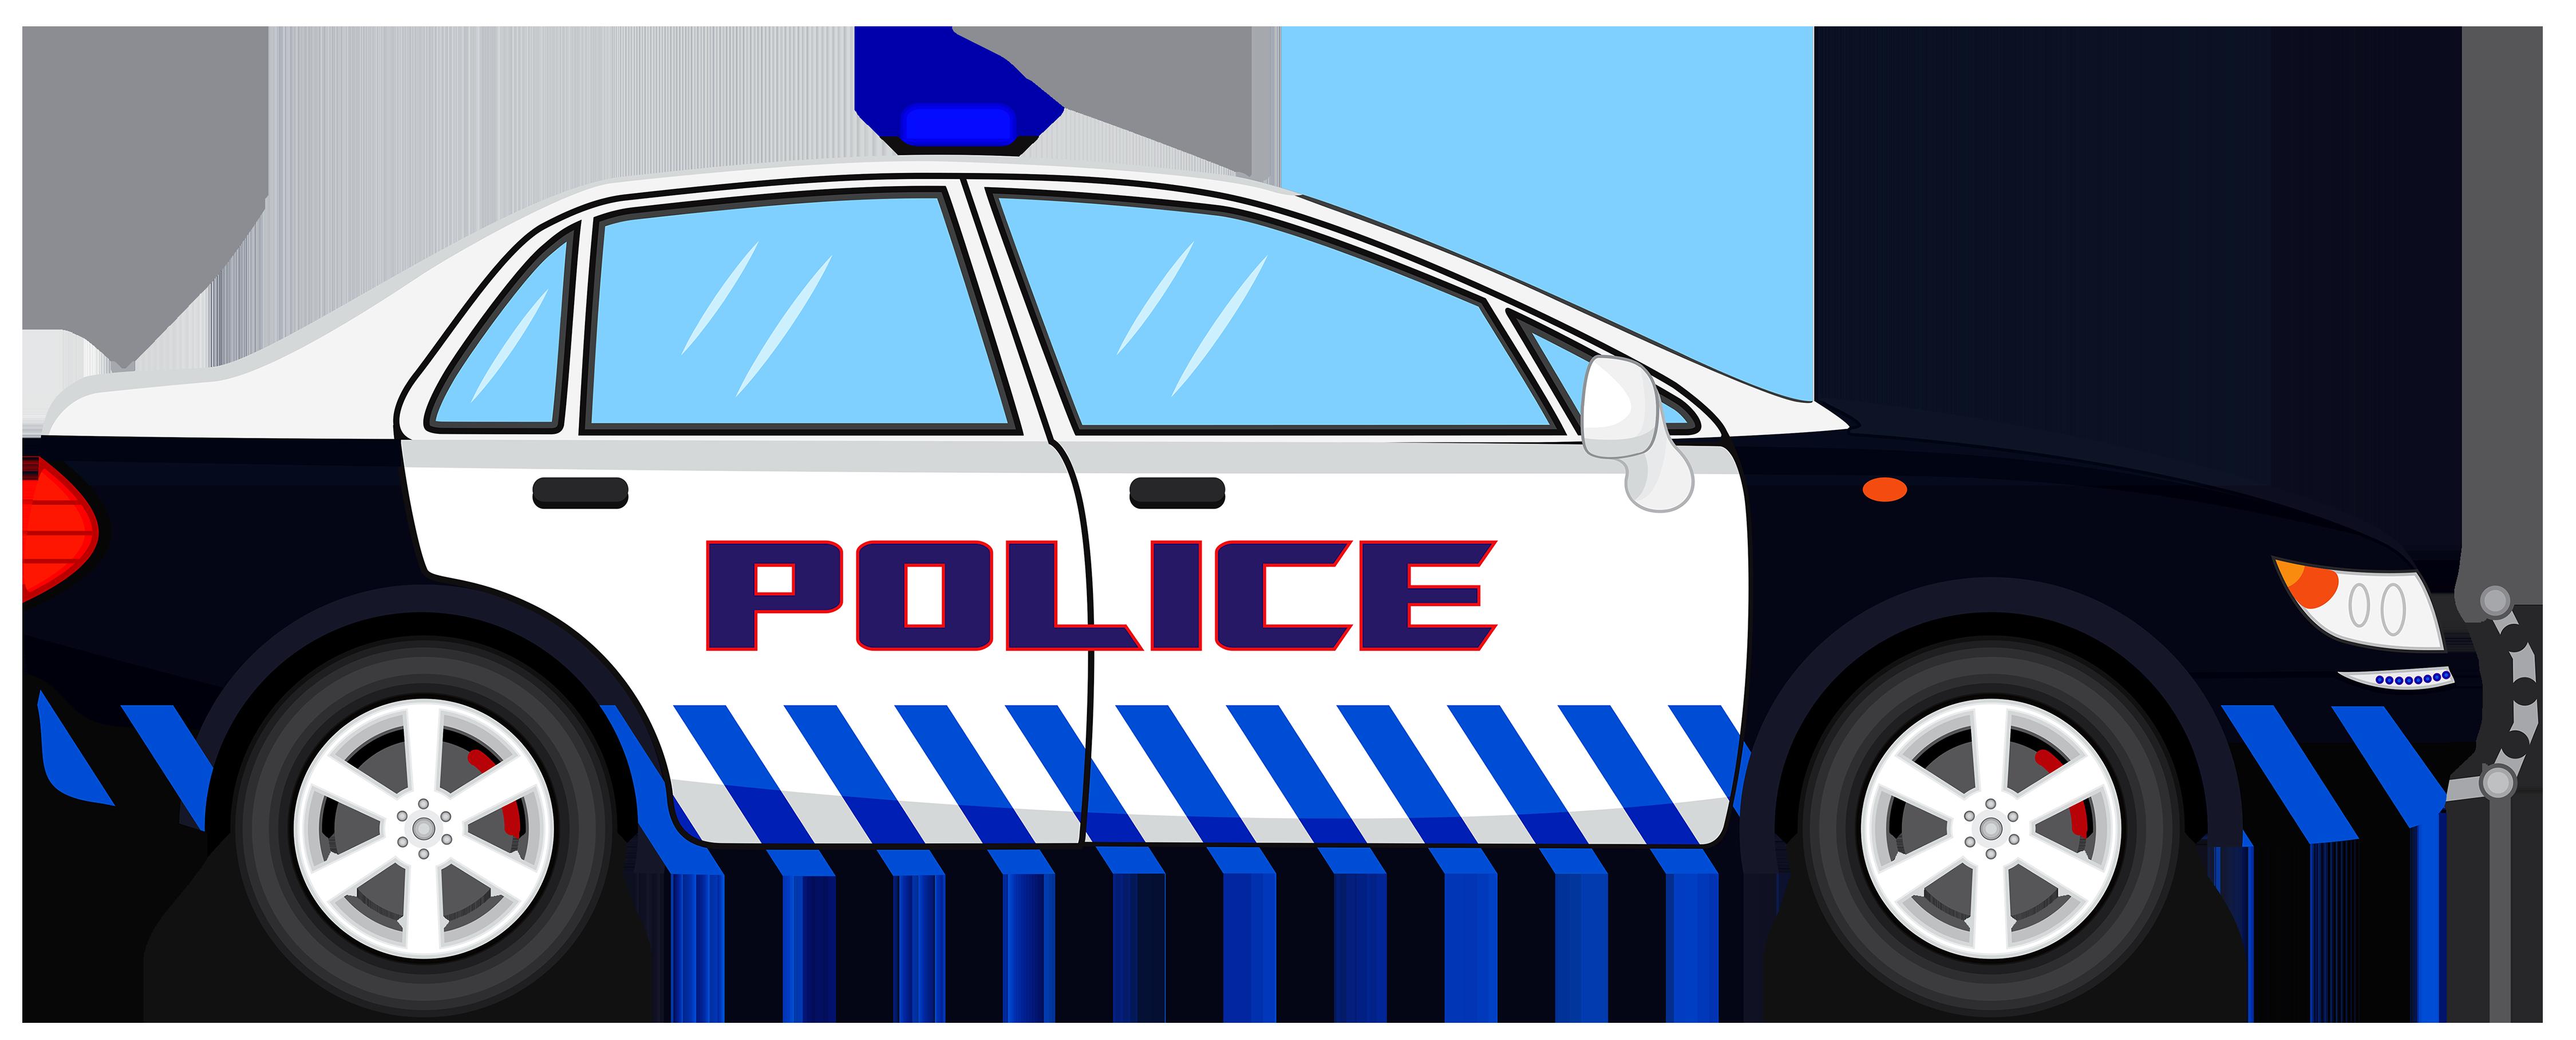 Police Car Transparent Clip Art Image-Police car transparent clip art image-17